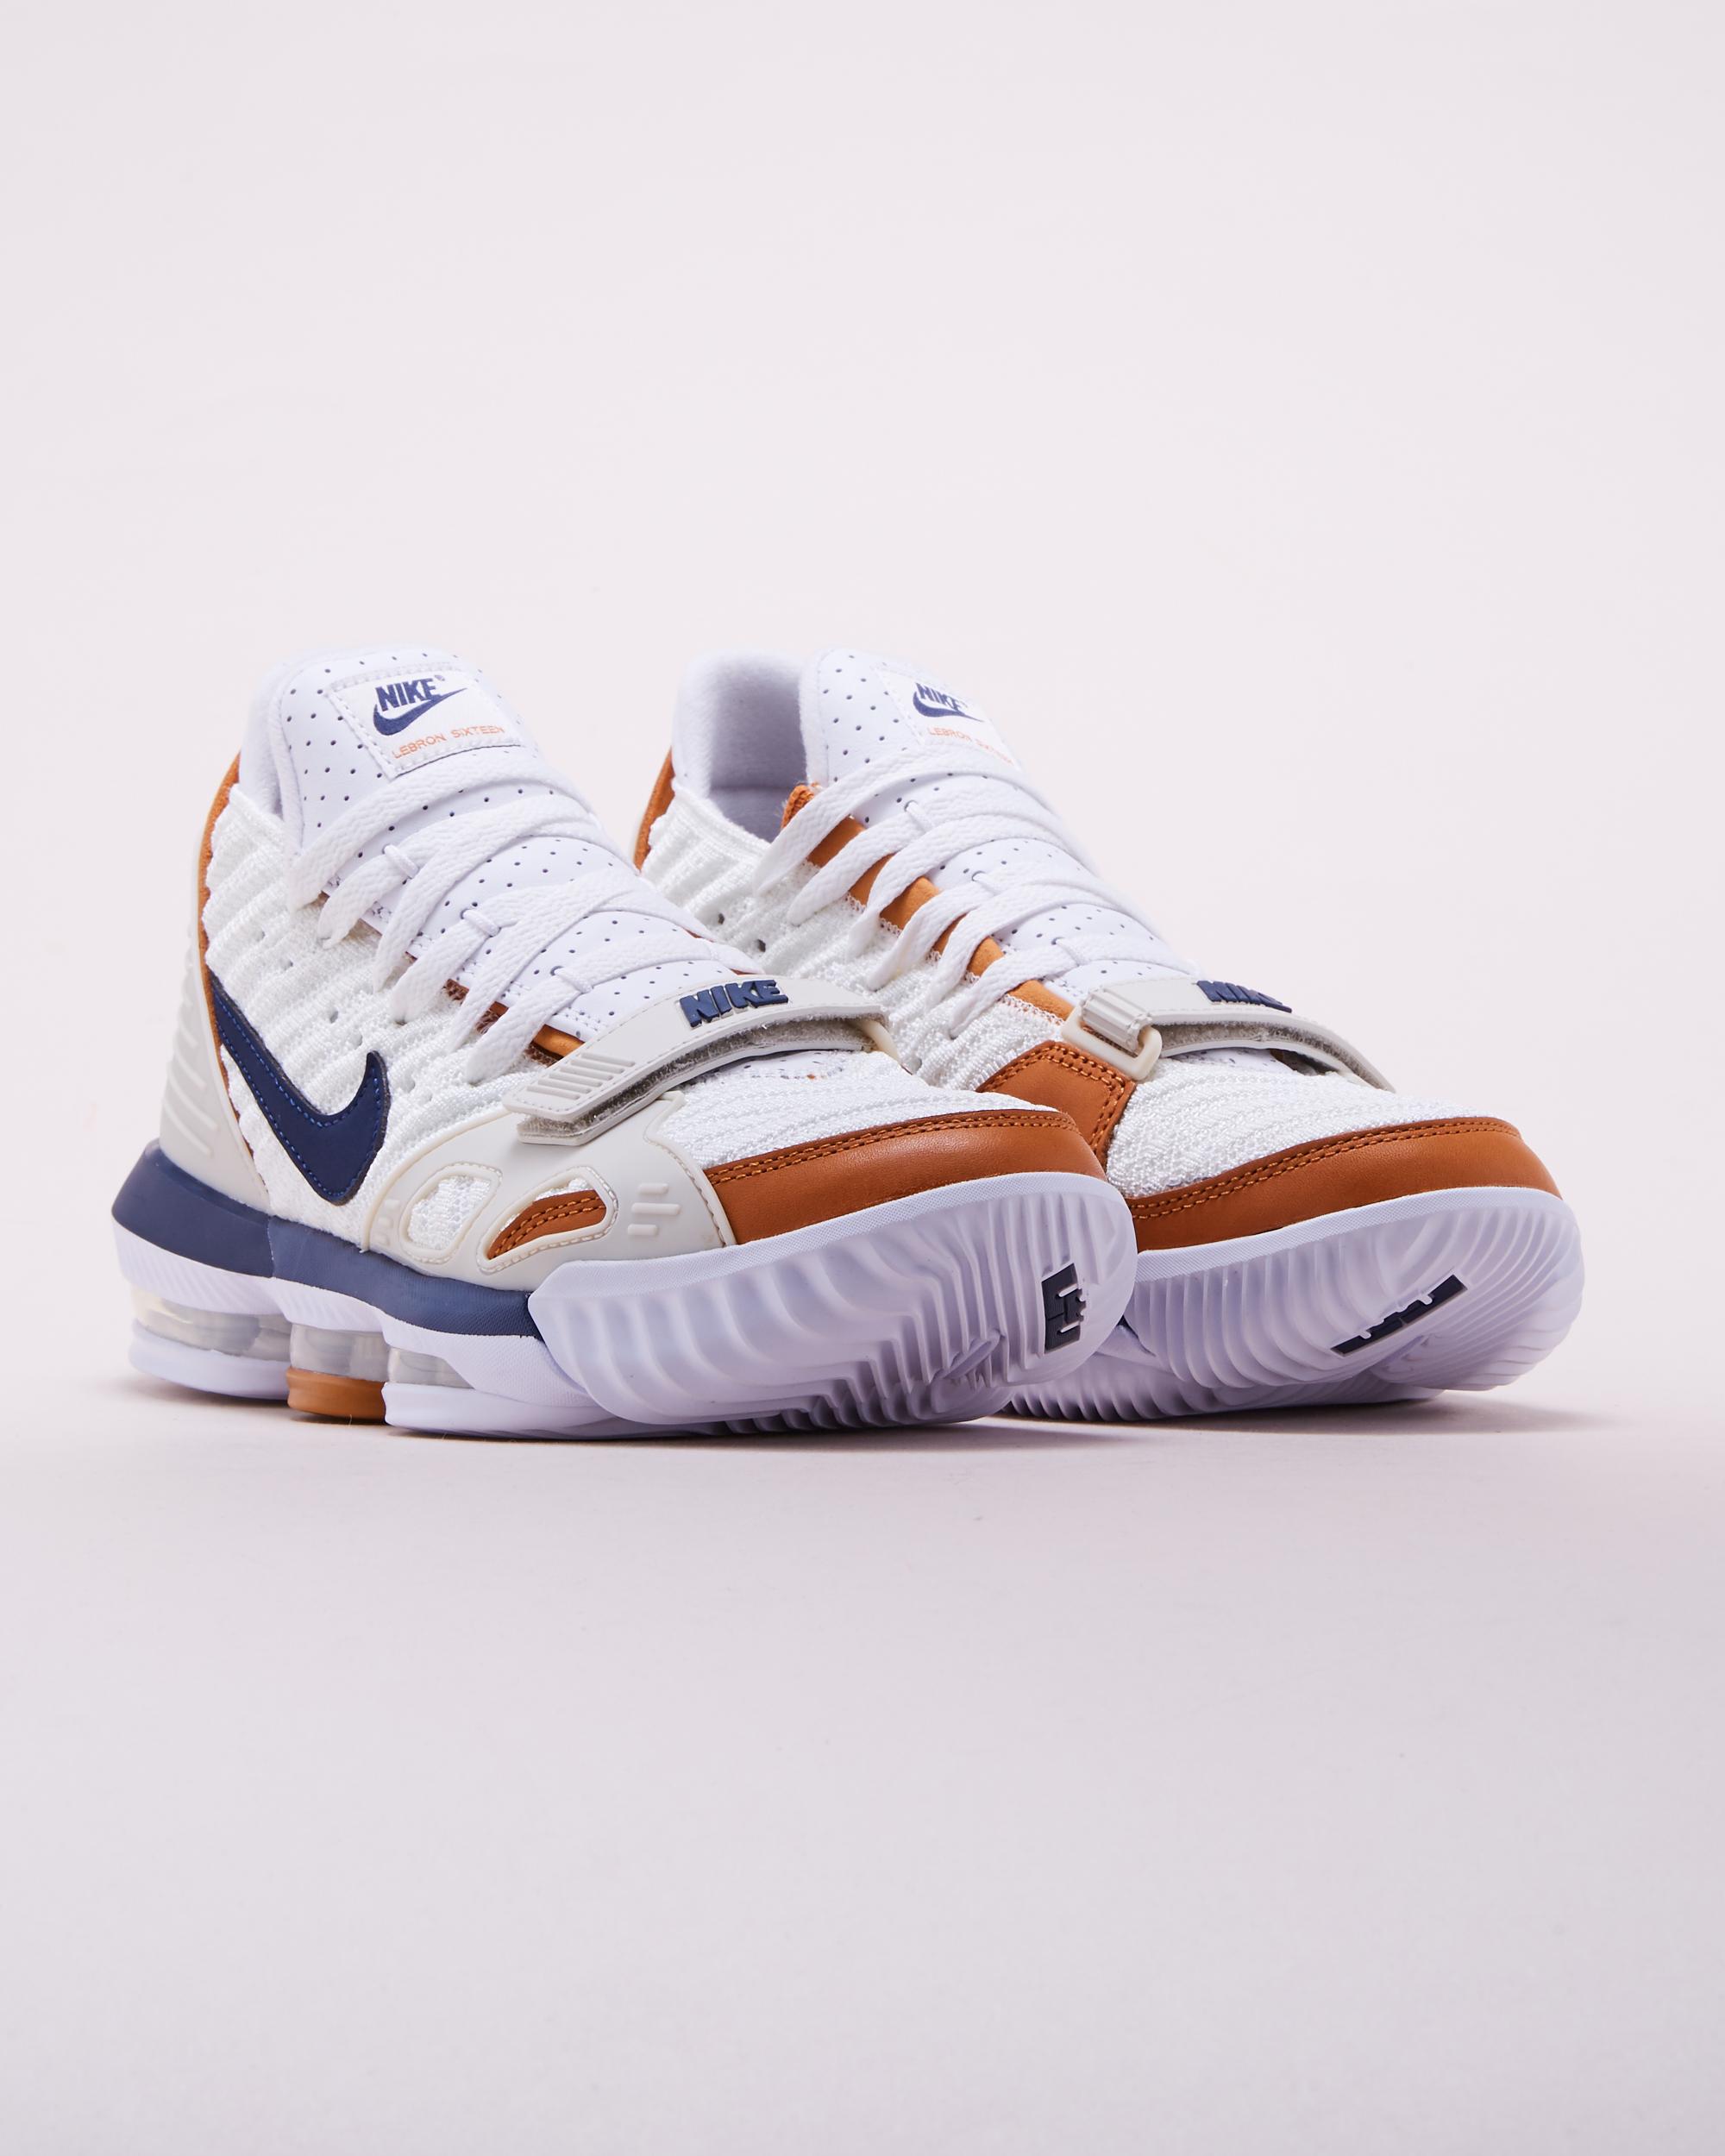 22408d187f64d The  Medicine Ball  Nike LeBron 16